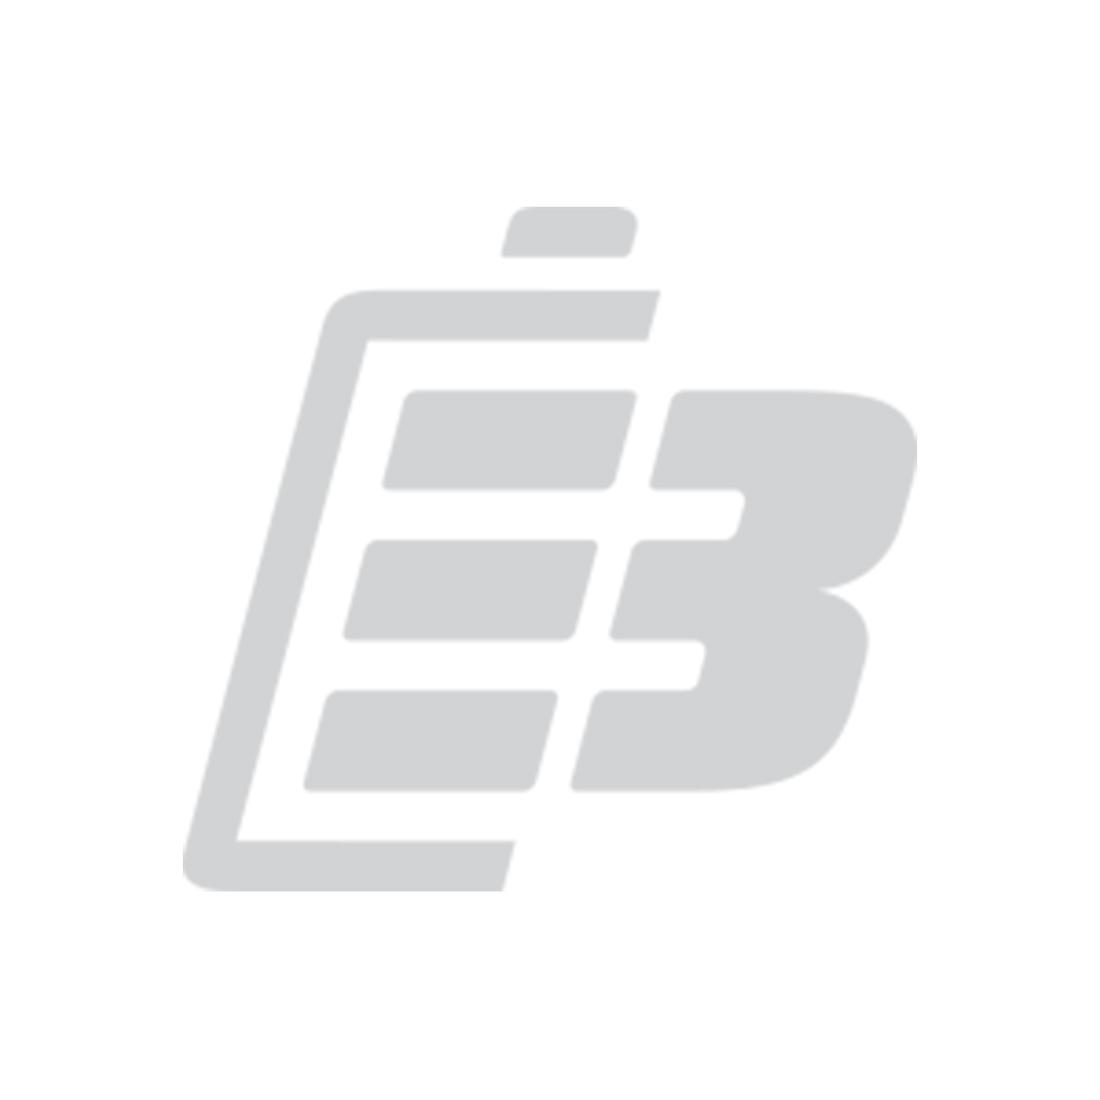 Smartphone battery Xiaomi Mi 5_1